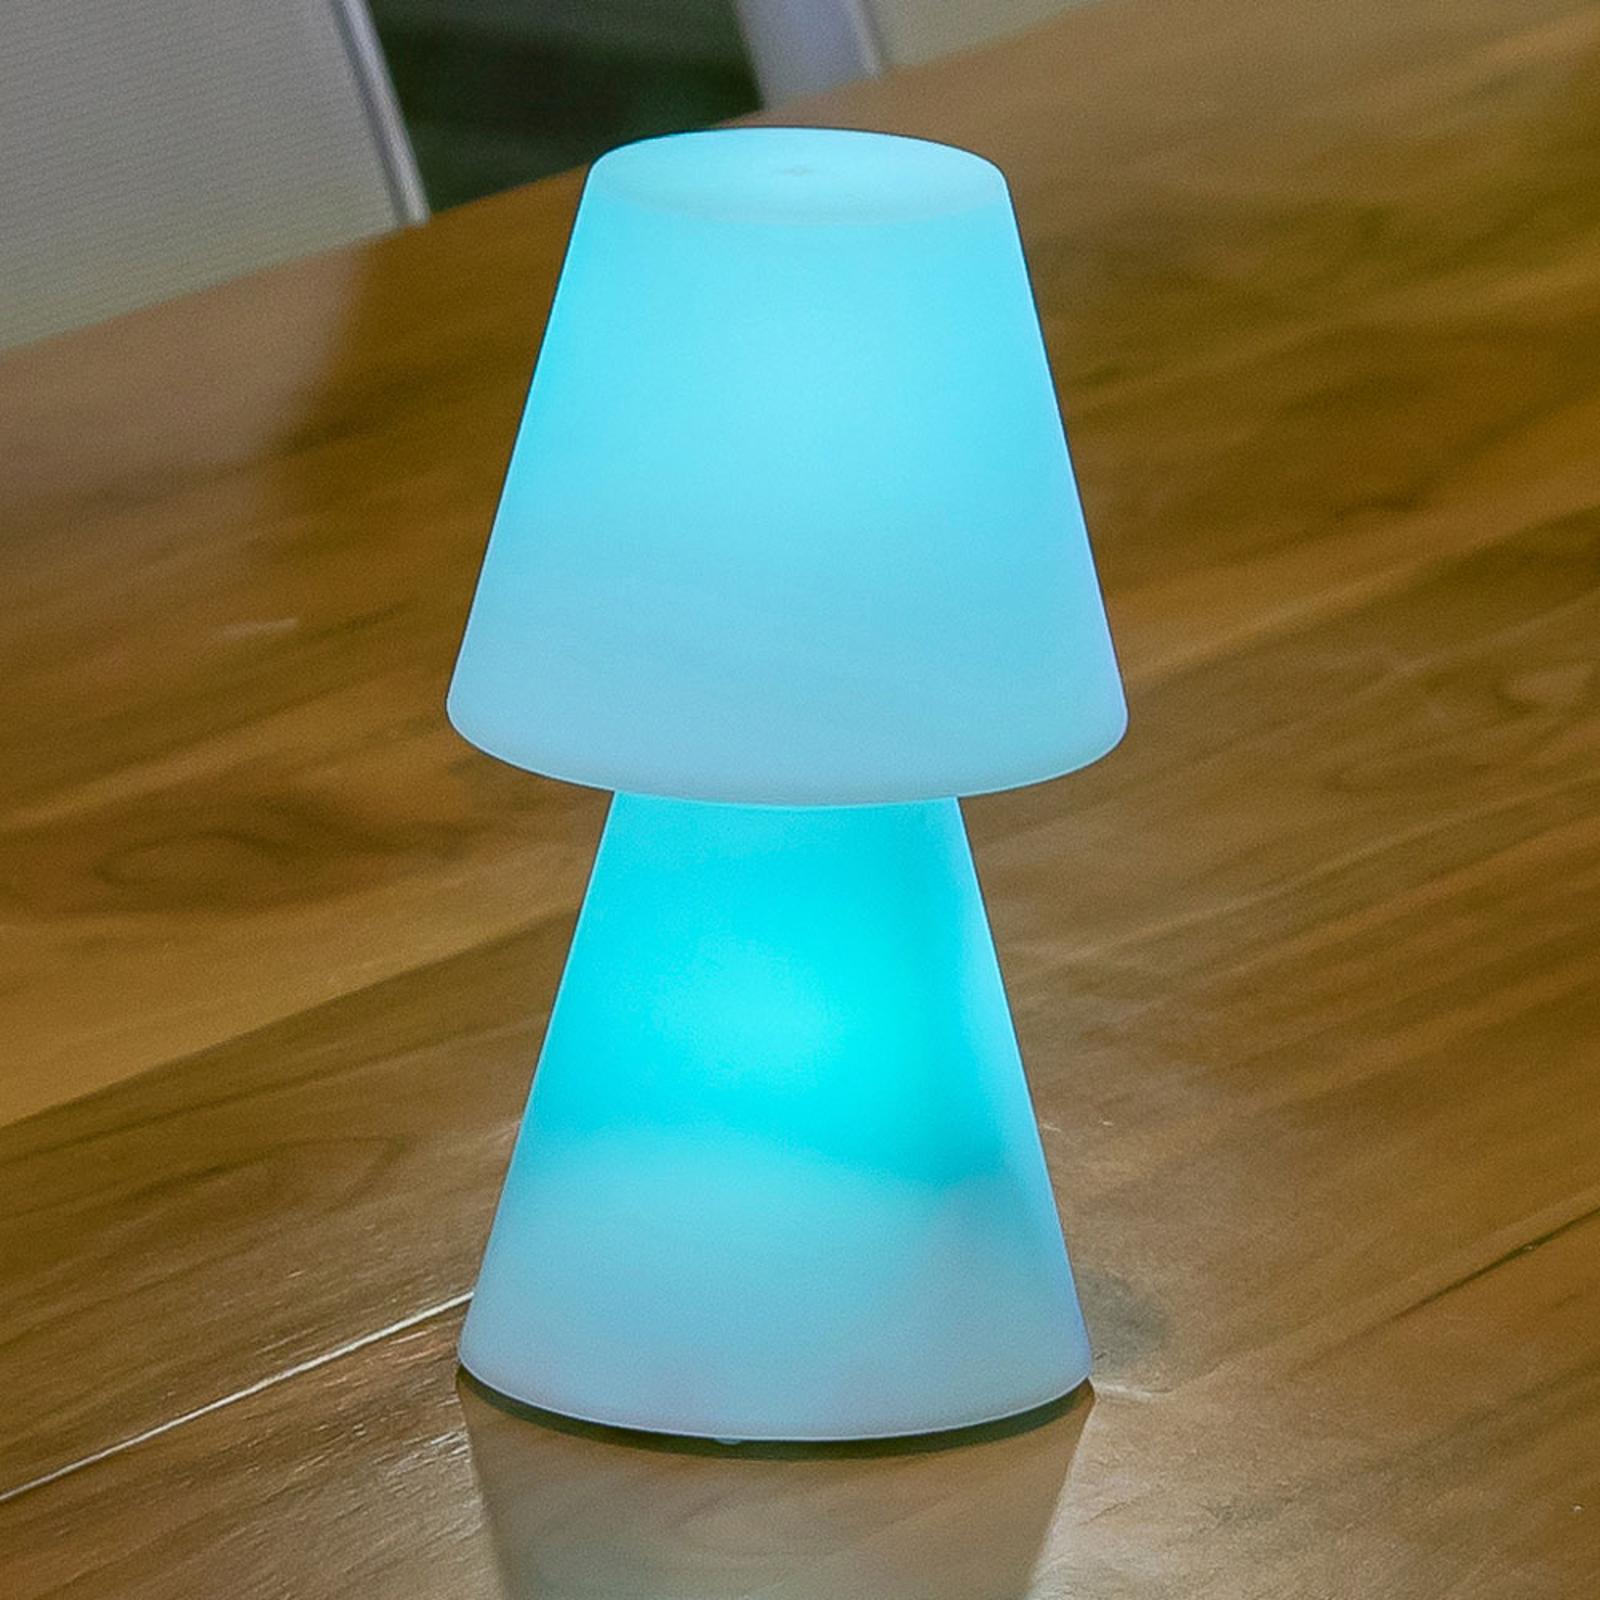 Newgarden Lola 20 LED-Tischlampe mit Akku